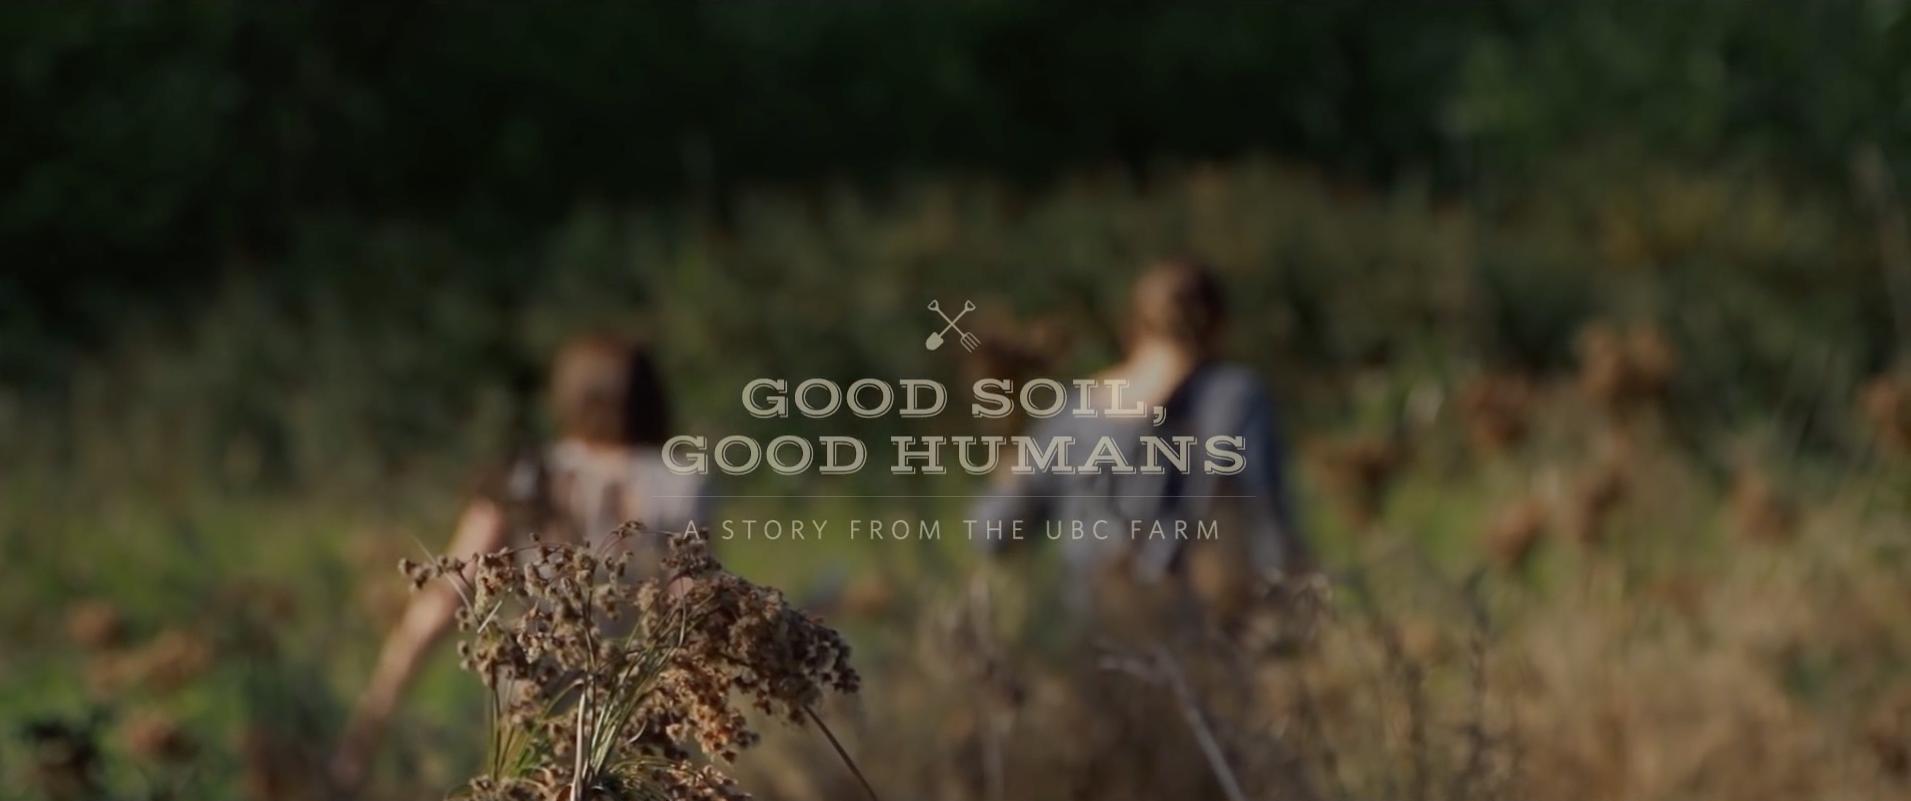 Good Soil, Good Humans